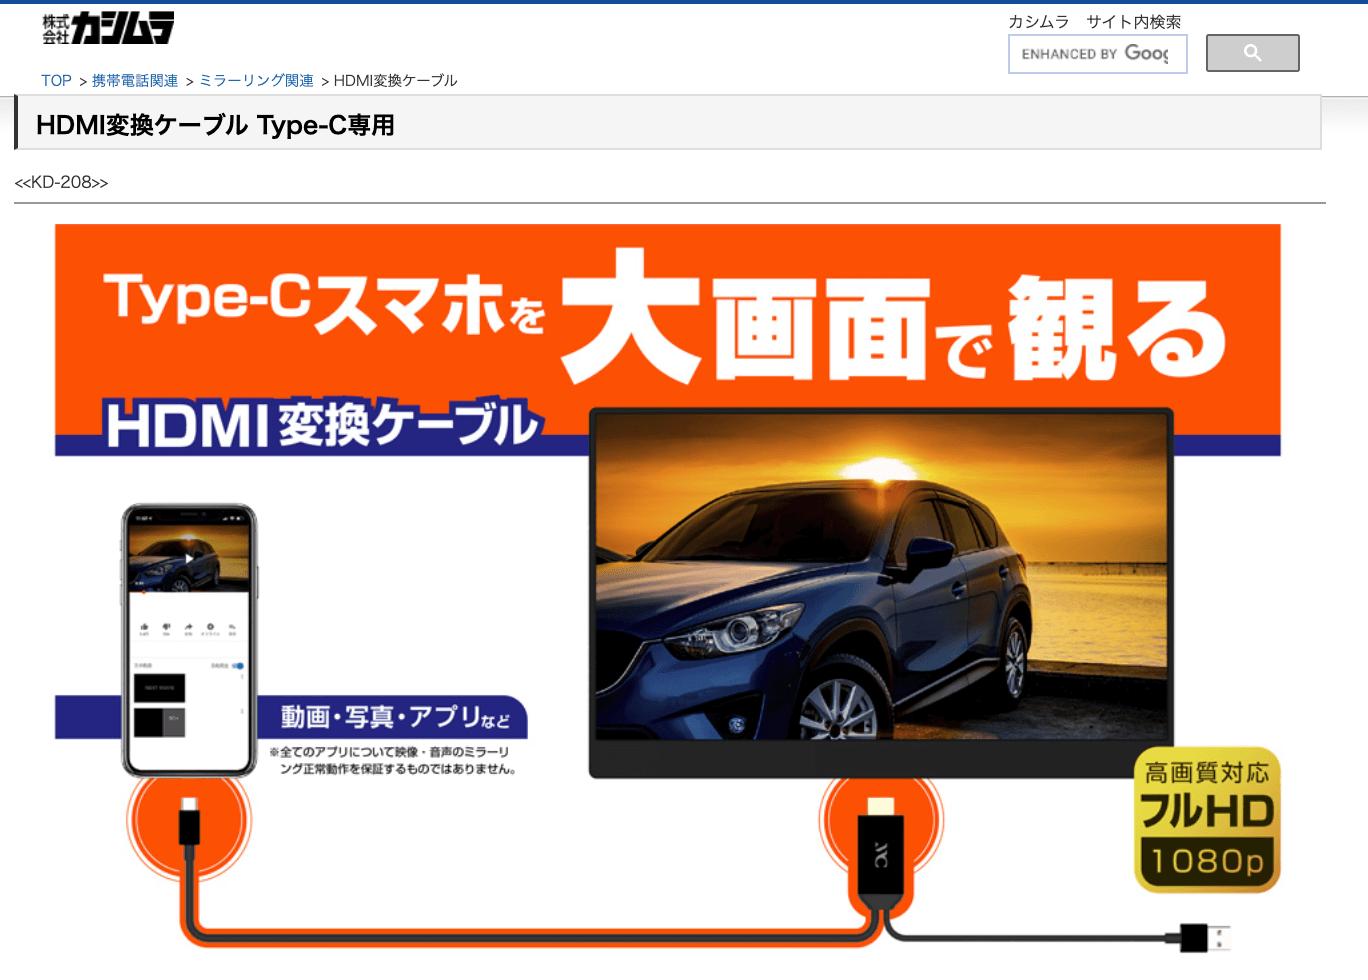 HDMI変換ケーブル Type-C専用